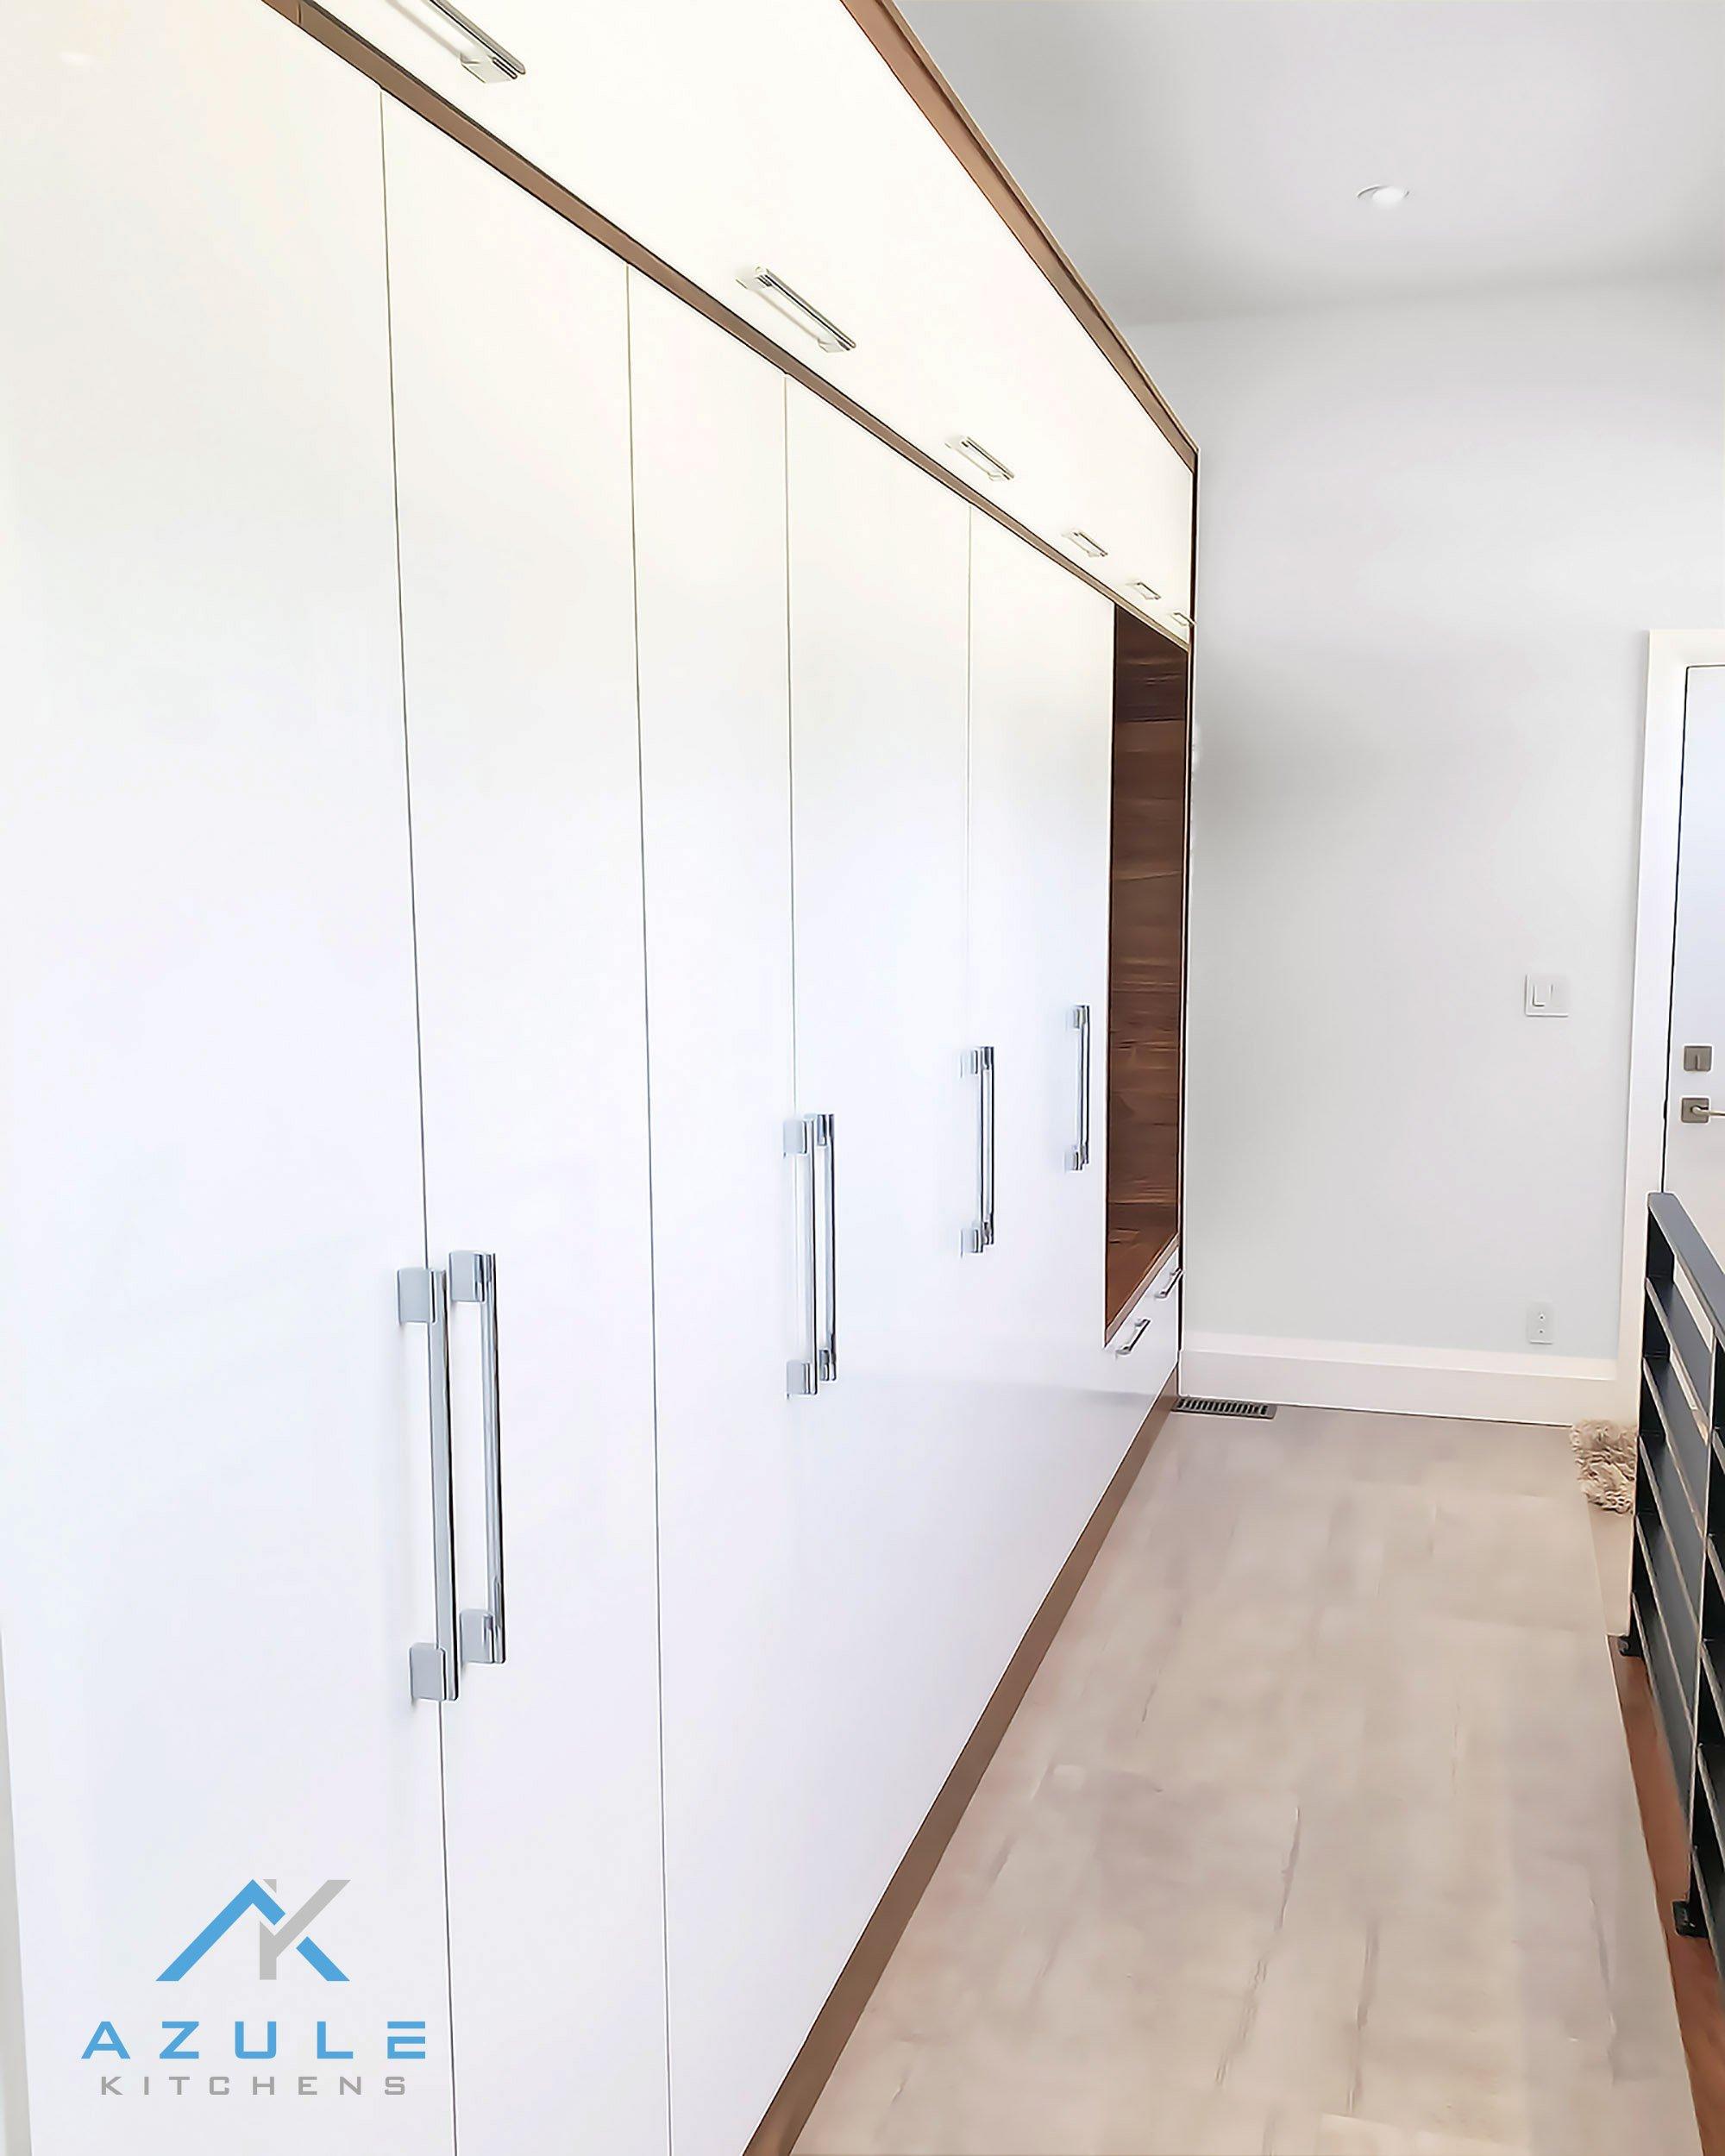 Azule Kitchens White And Walnut Modern Bethany Tilstra